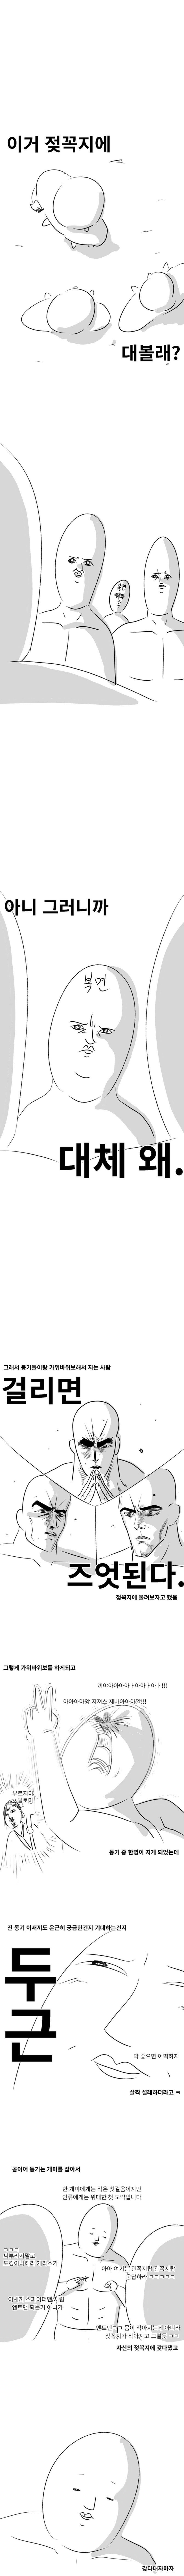 viewimage.php?id=2ebcc232eadd36&no=24b0d769e1d32ca73fec81fa11d02831b46f6c3837711f4400726c62dc68225a898621a50493388c37d03a7e3482a5b15a0a73d73e265a70f82efcaa4e6d0f27776da20890a10f72943f46e4c8bd260fcd5207afc7d546a7324465441de30c6a6666c9648a74562a